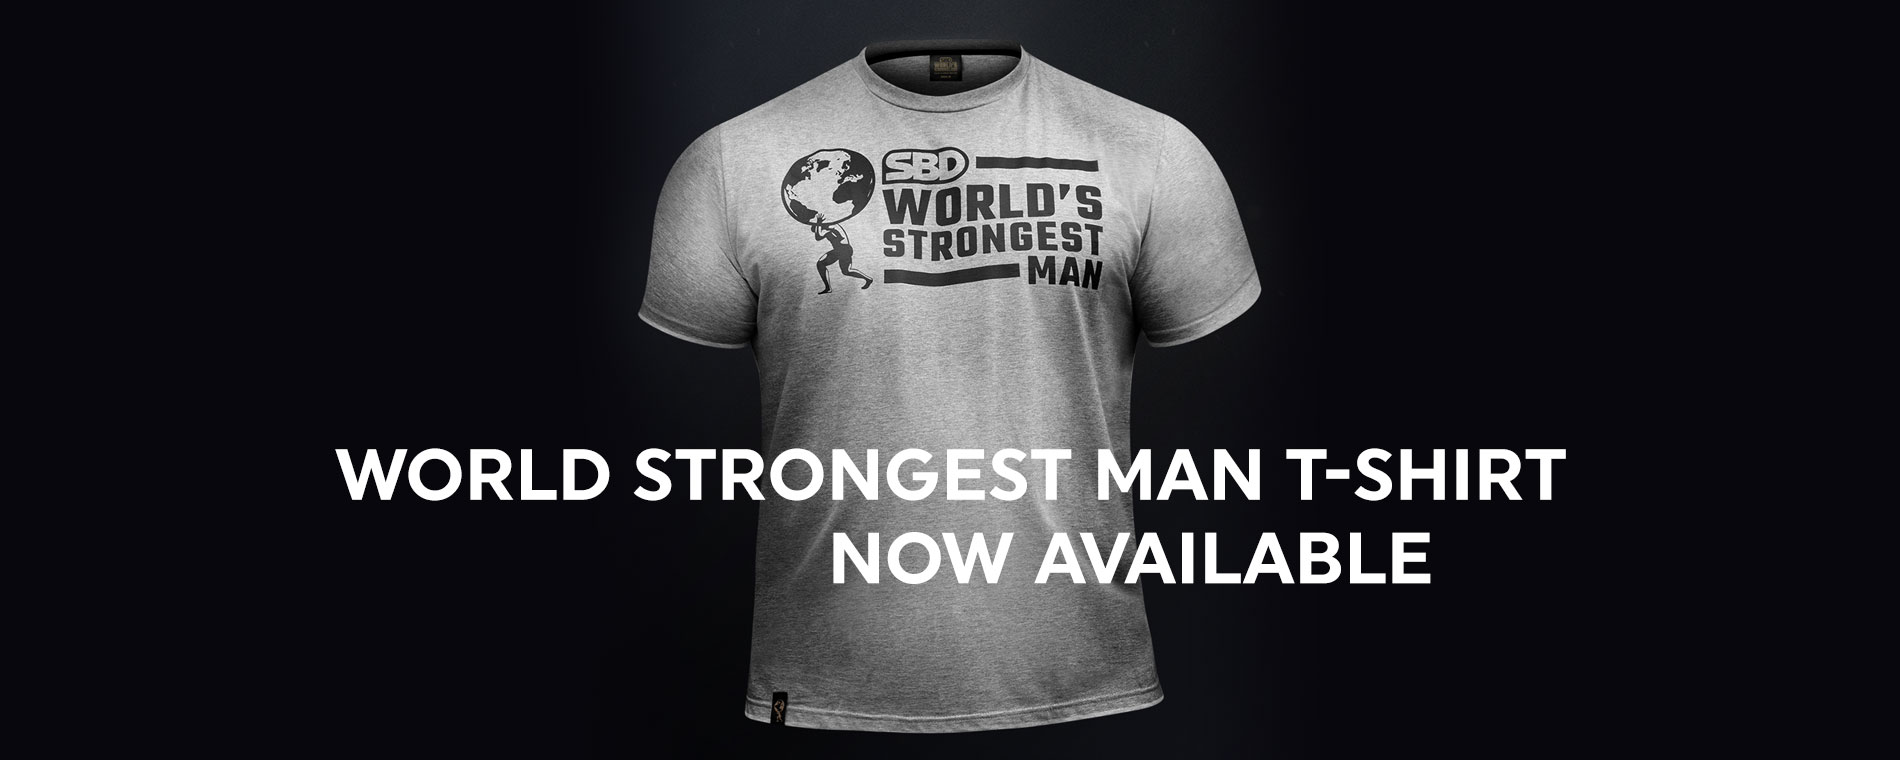 world-strongest-man-tshirt-sbd-belgium-20201030